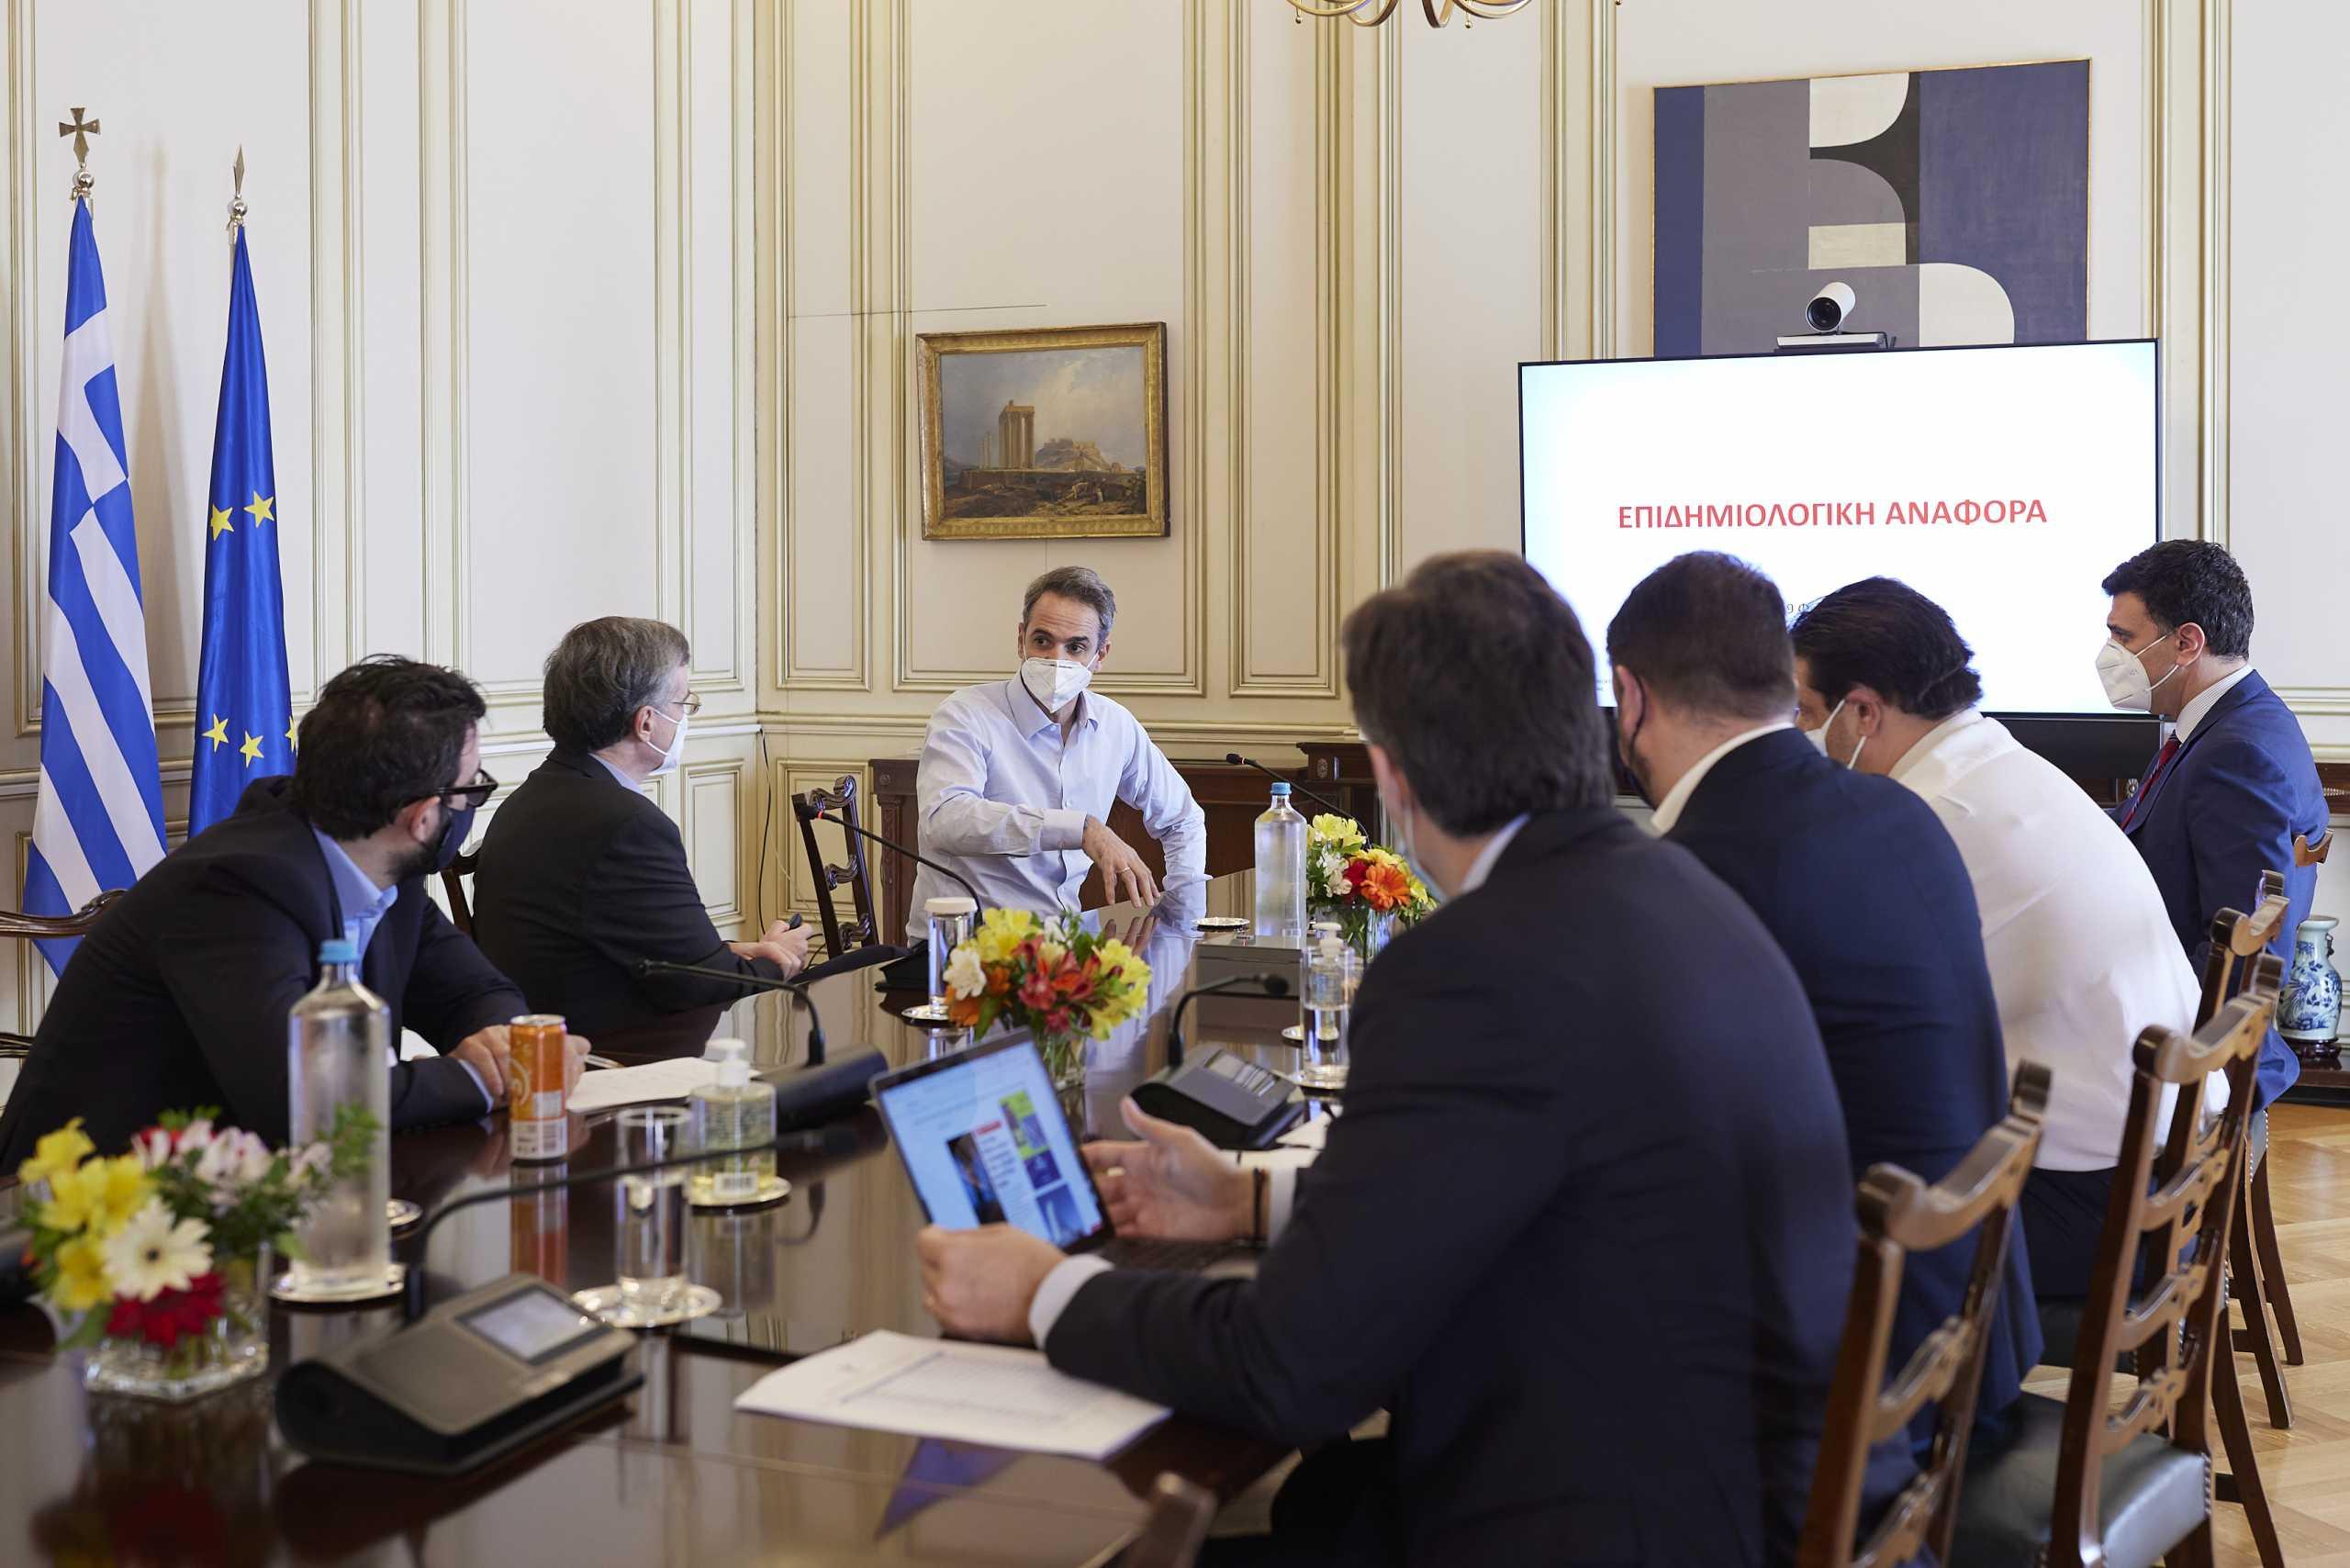 Lockdown στην Αττική – Κικίλιας: Ο πρωθυπουργός ζήτησε έκτακτη σύγκληση της επιτροπής